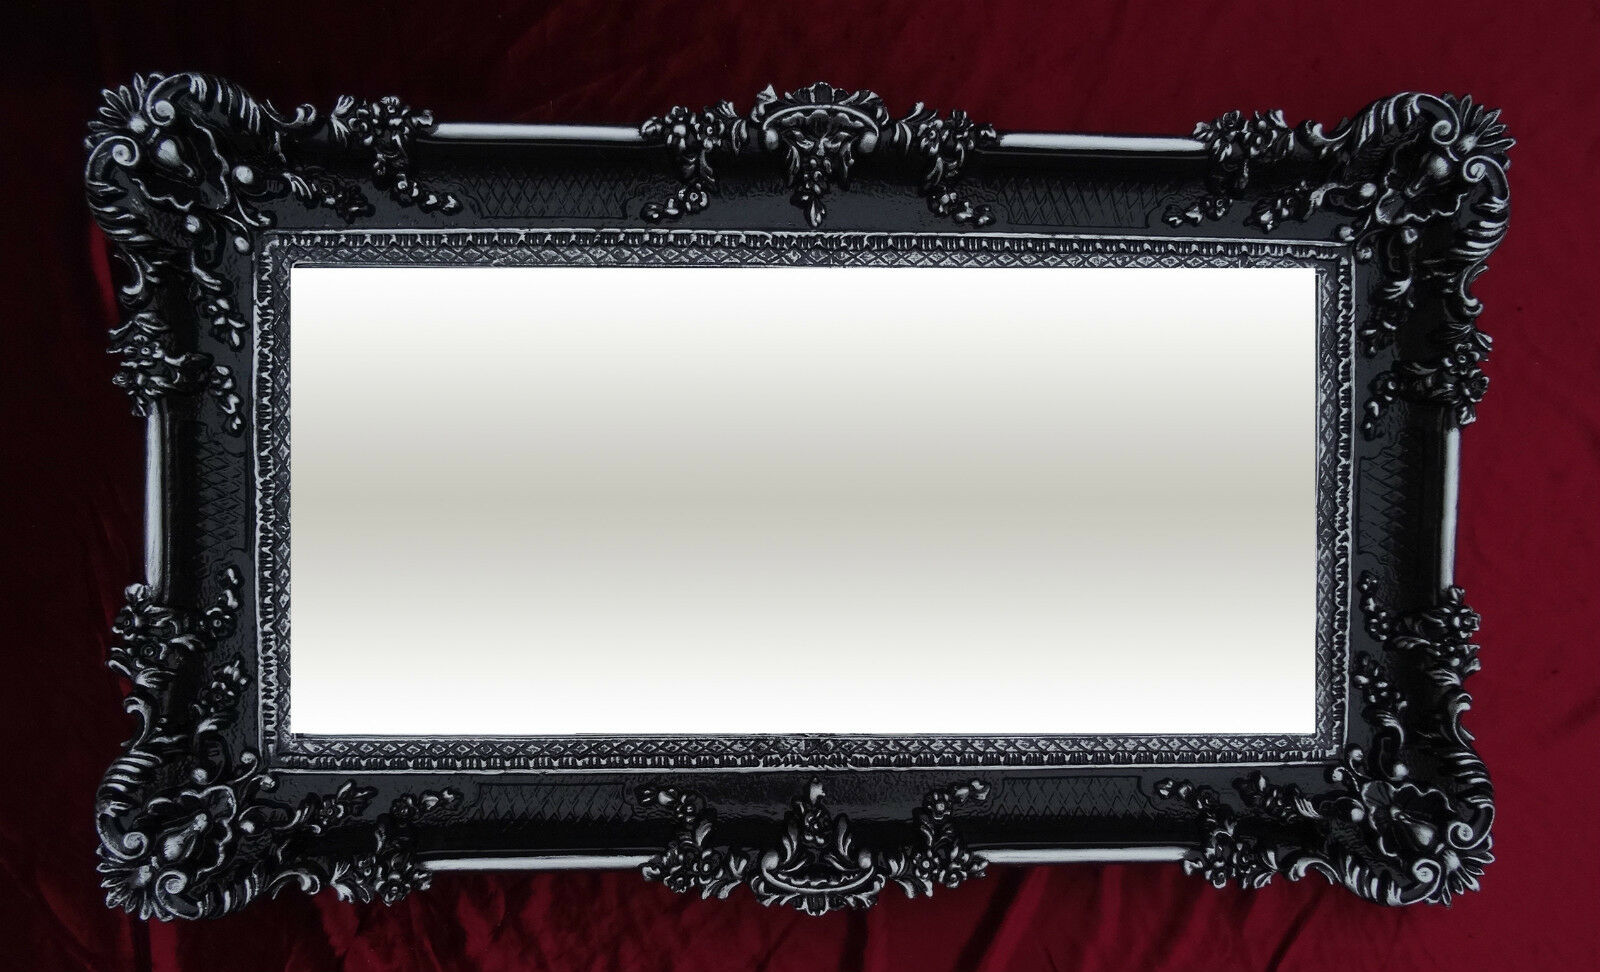 Miroir mural noir argent 96x57 ancien baroque shabby chic for Force de miroir ebay